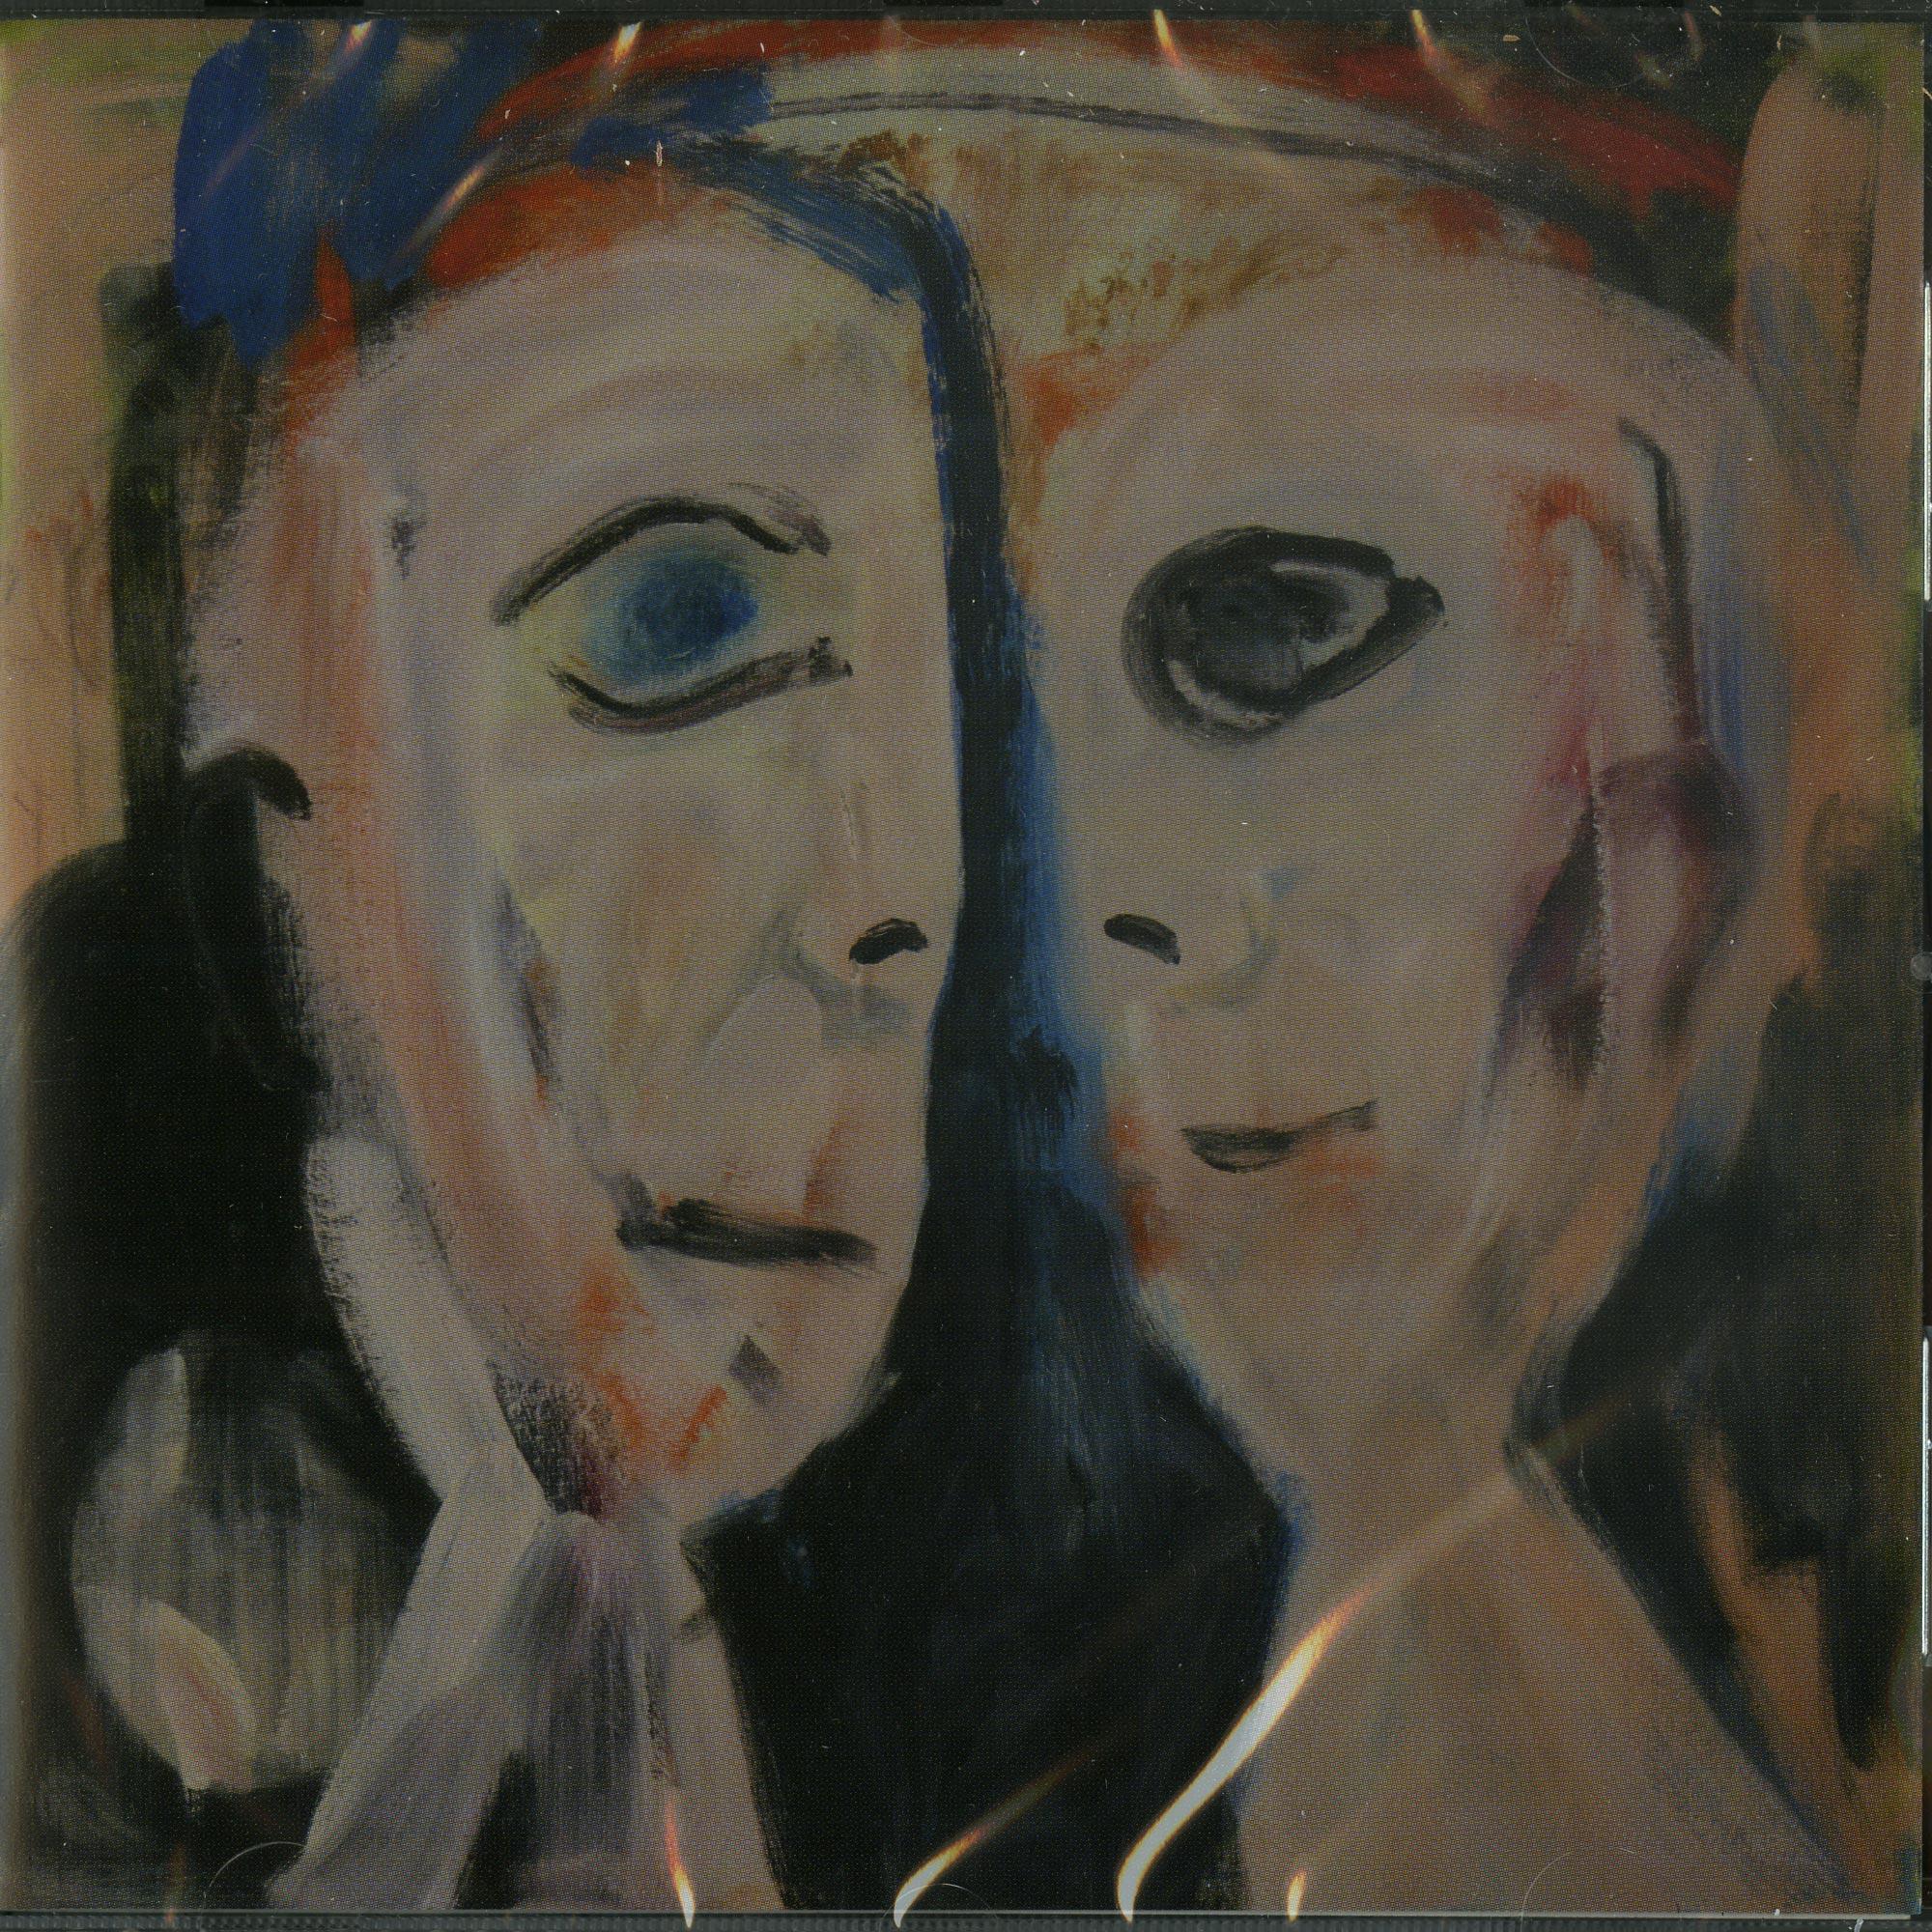 Sebastian Mullaert & Eitan Reiter - REFLECTIONS OF NOTHINGNESS